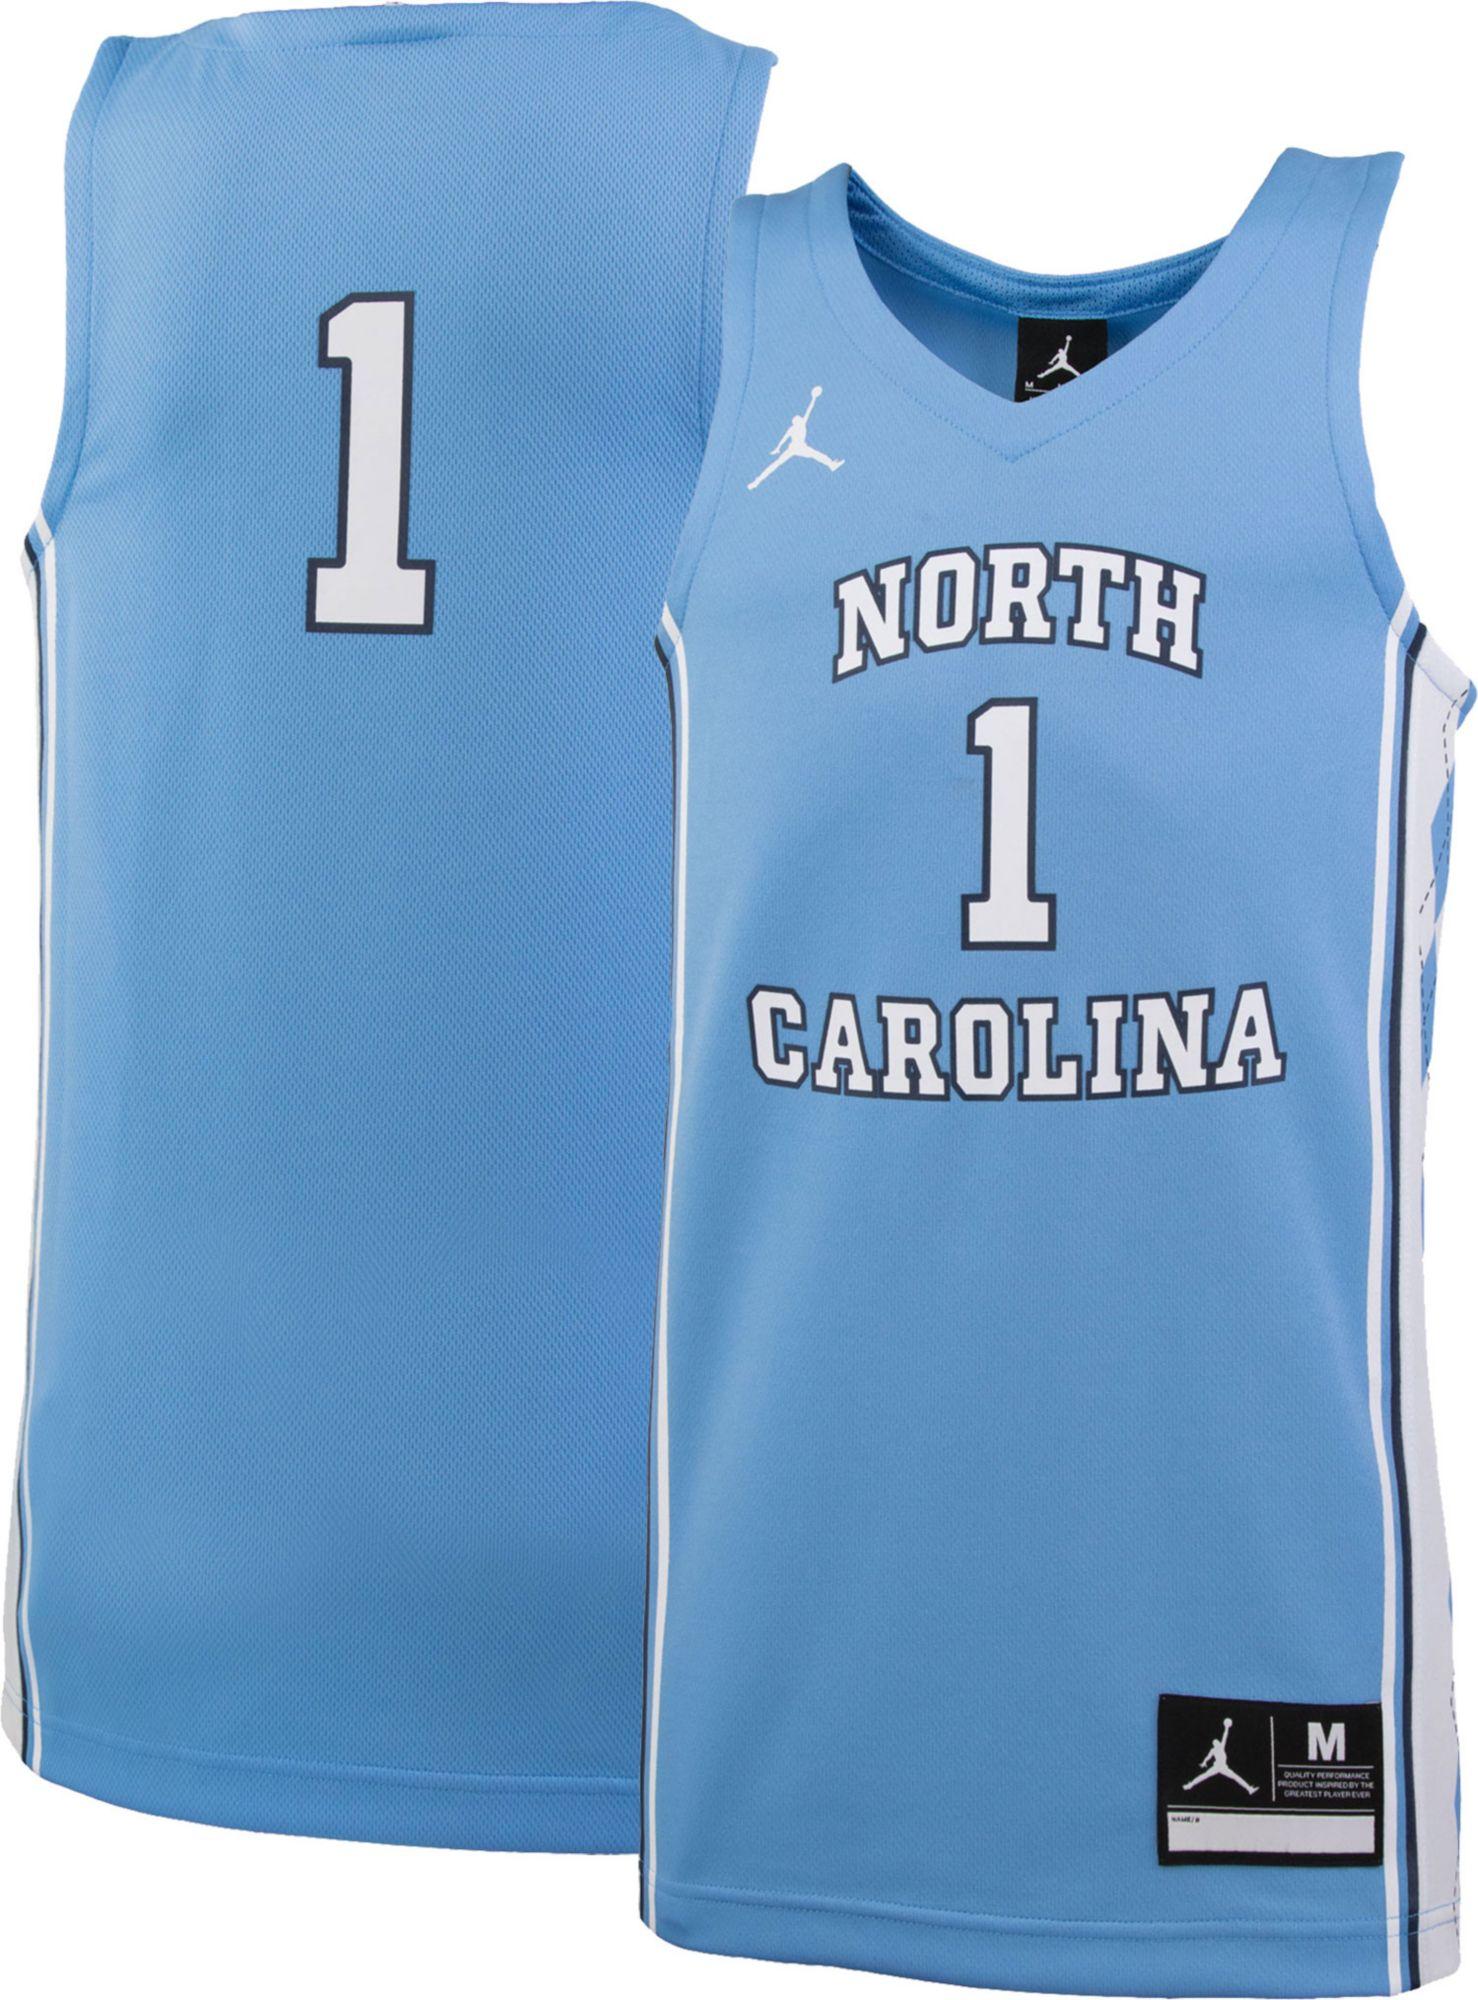 nike michael jordan north carolina tar heels brand jordan authentic  basketball jersey light blue  noimagefound 877612132